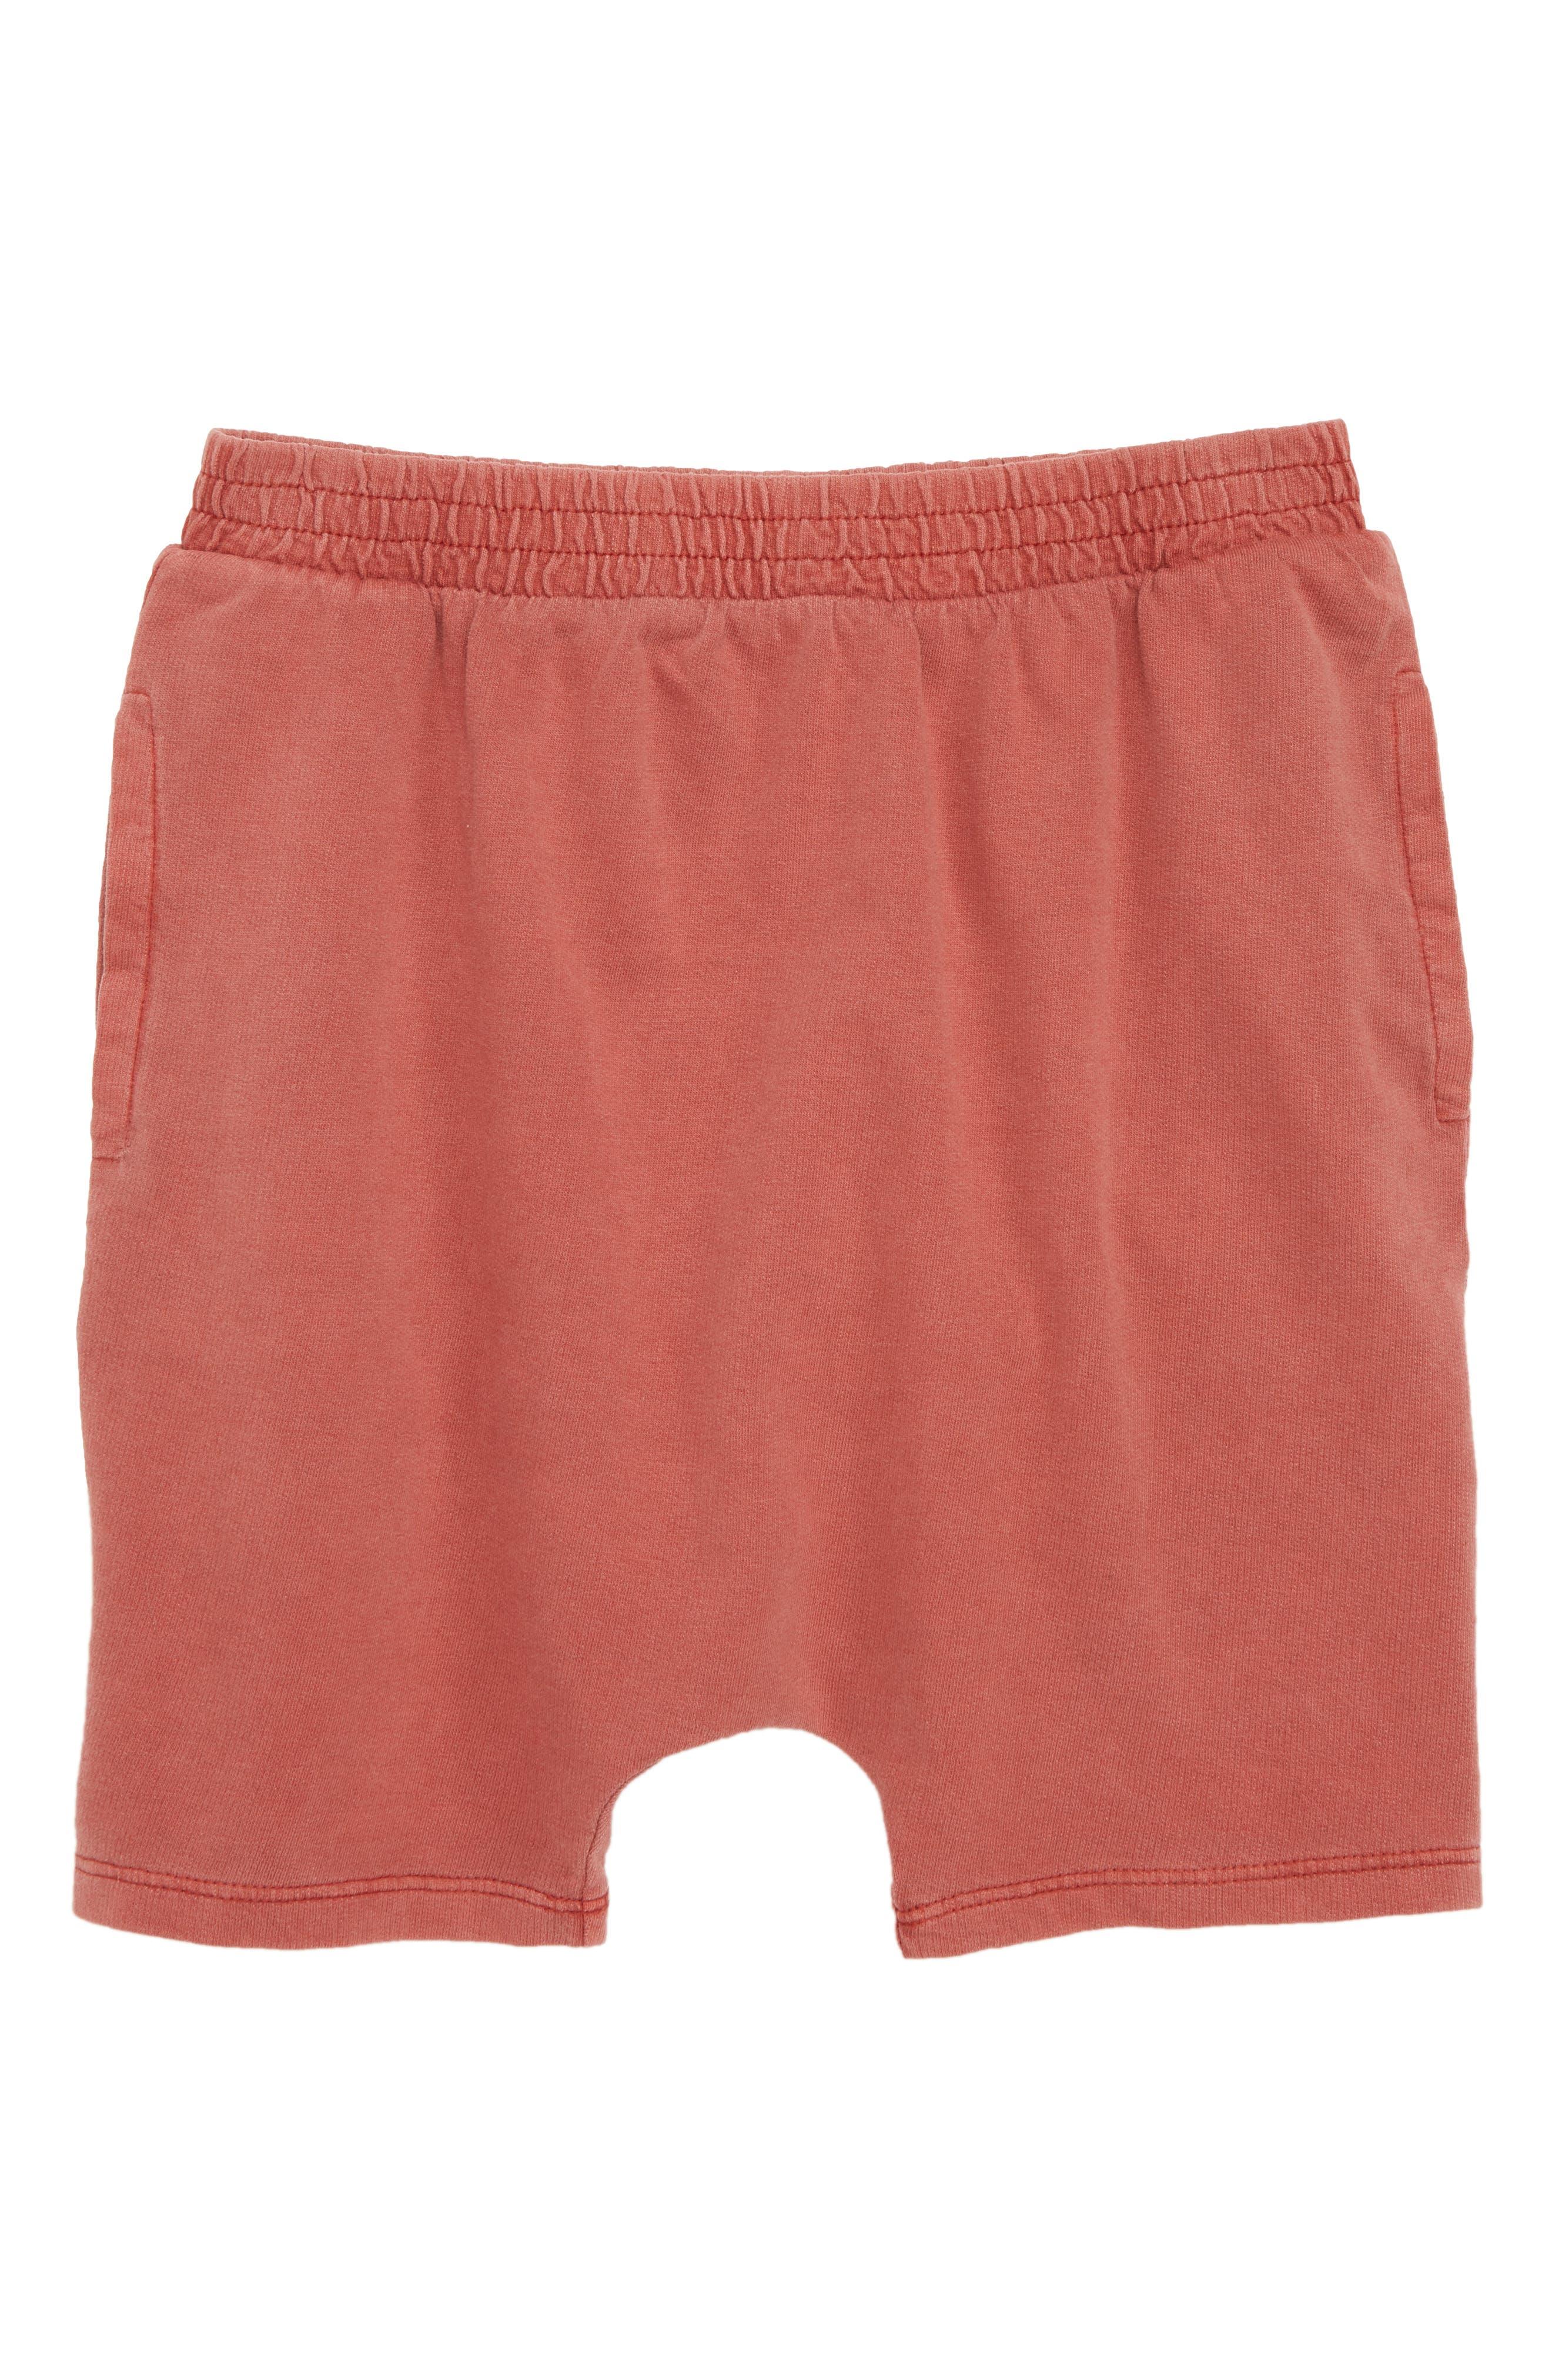 Alternate Image 1 Selected - Stem Superwash Shorts (Toddler Boys, Little Boys & Big Boys)